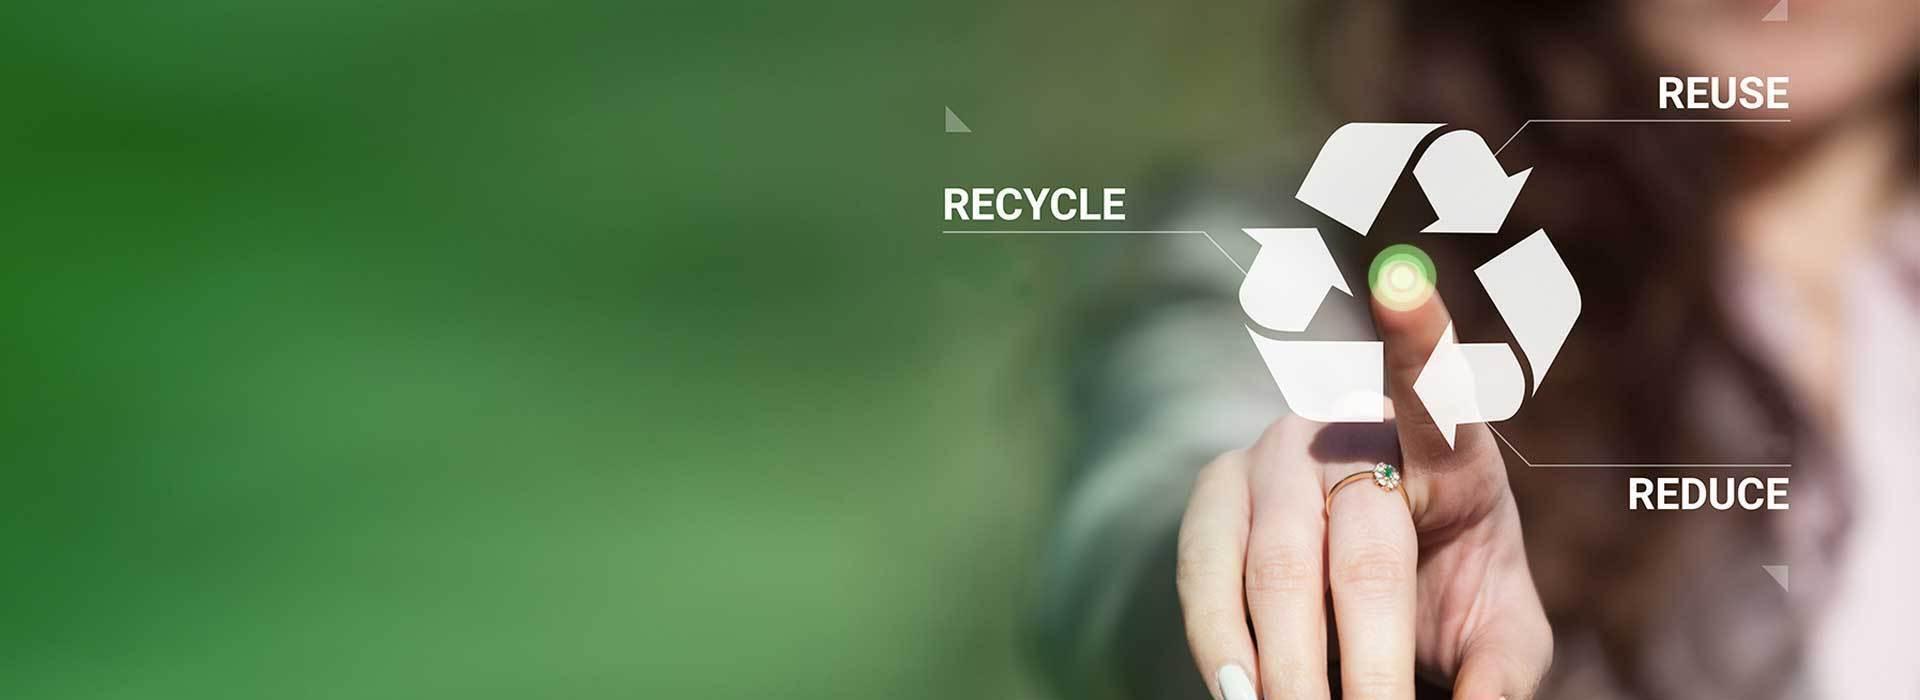 IT Recycling London, IT Disposal London, PC Recycling London